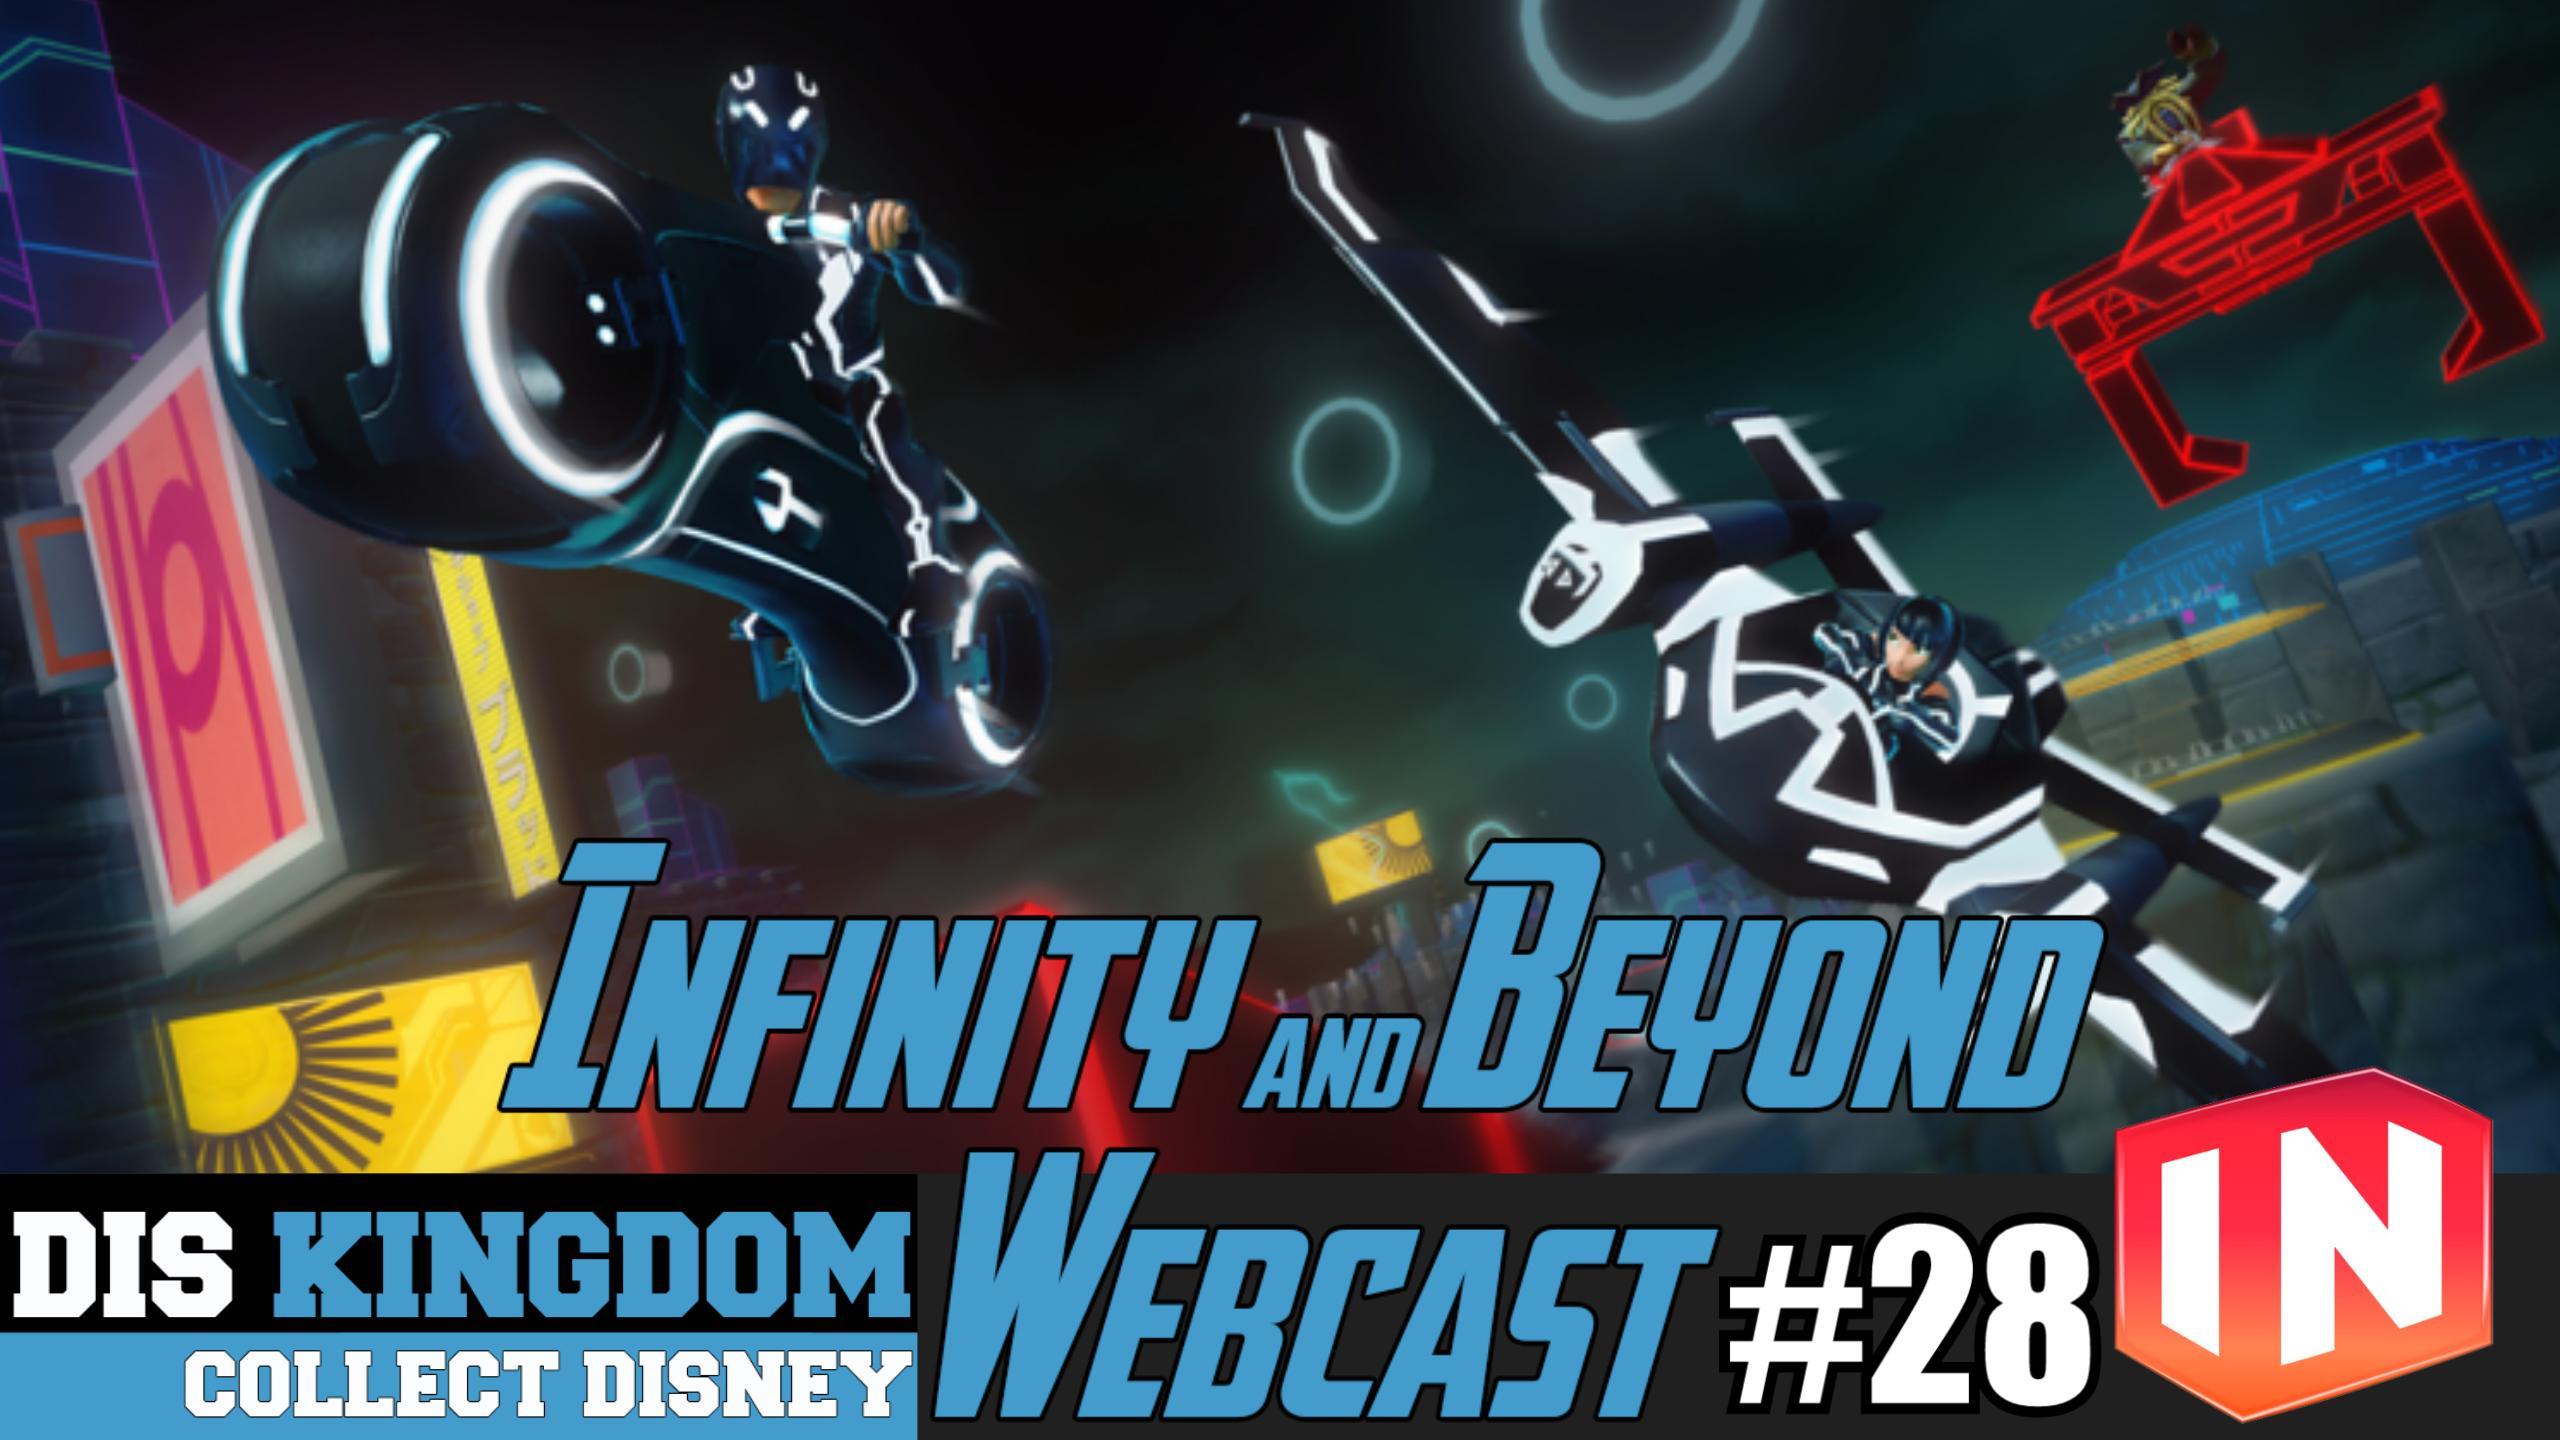 Disney Infinity & Beyond Webcast #28  – Tron Digital Aftermath